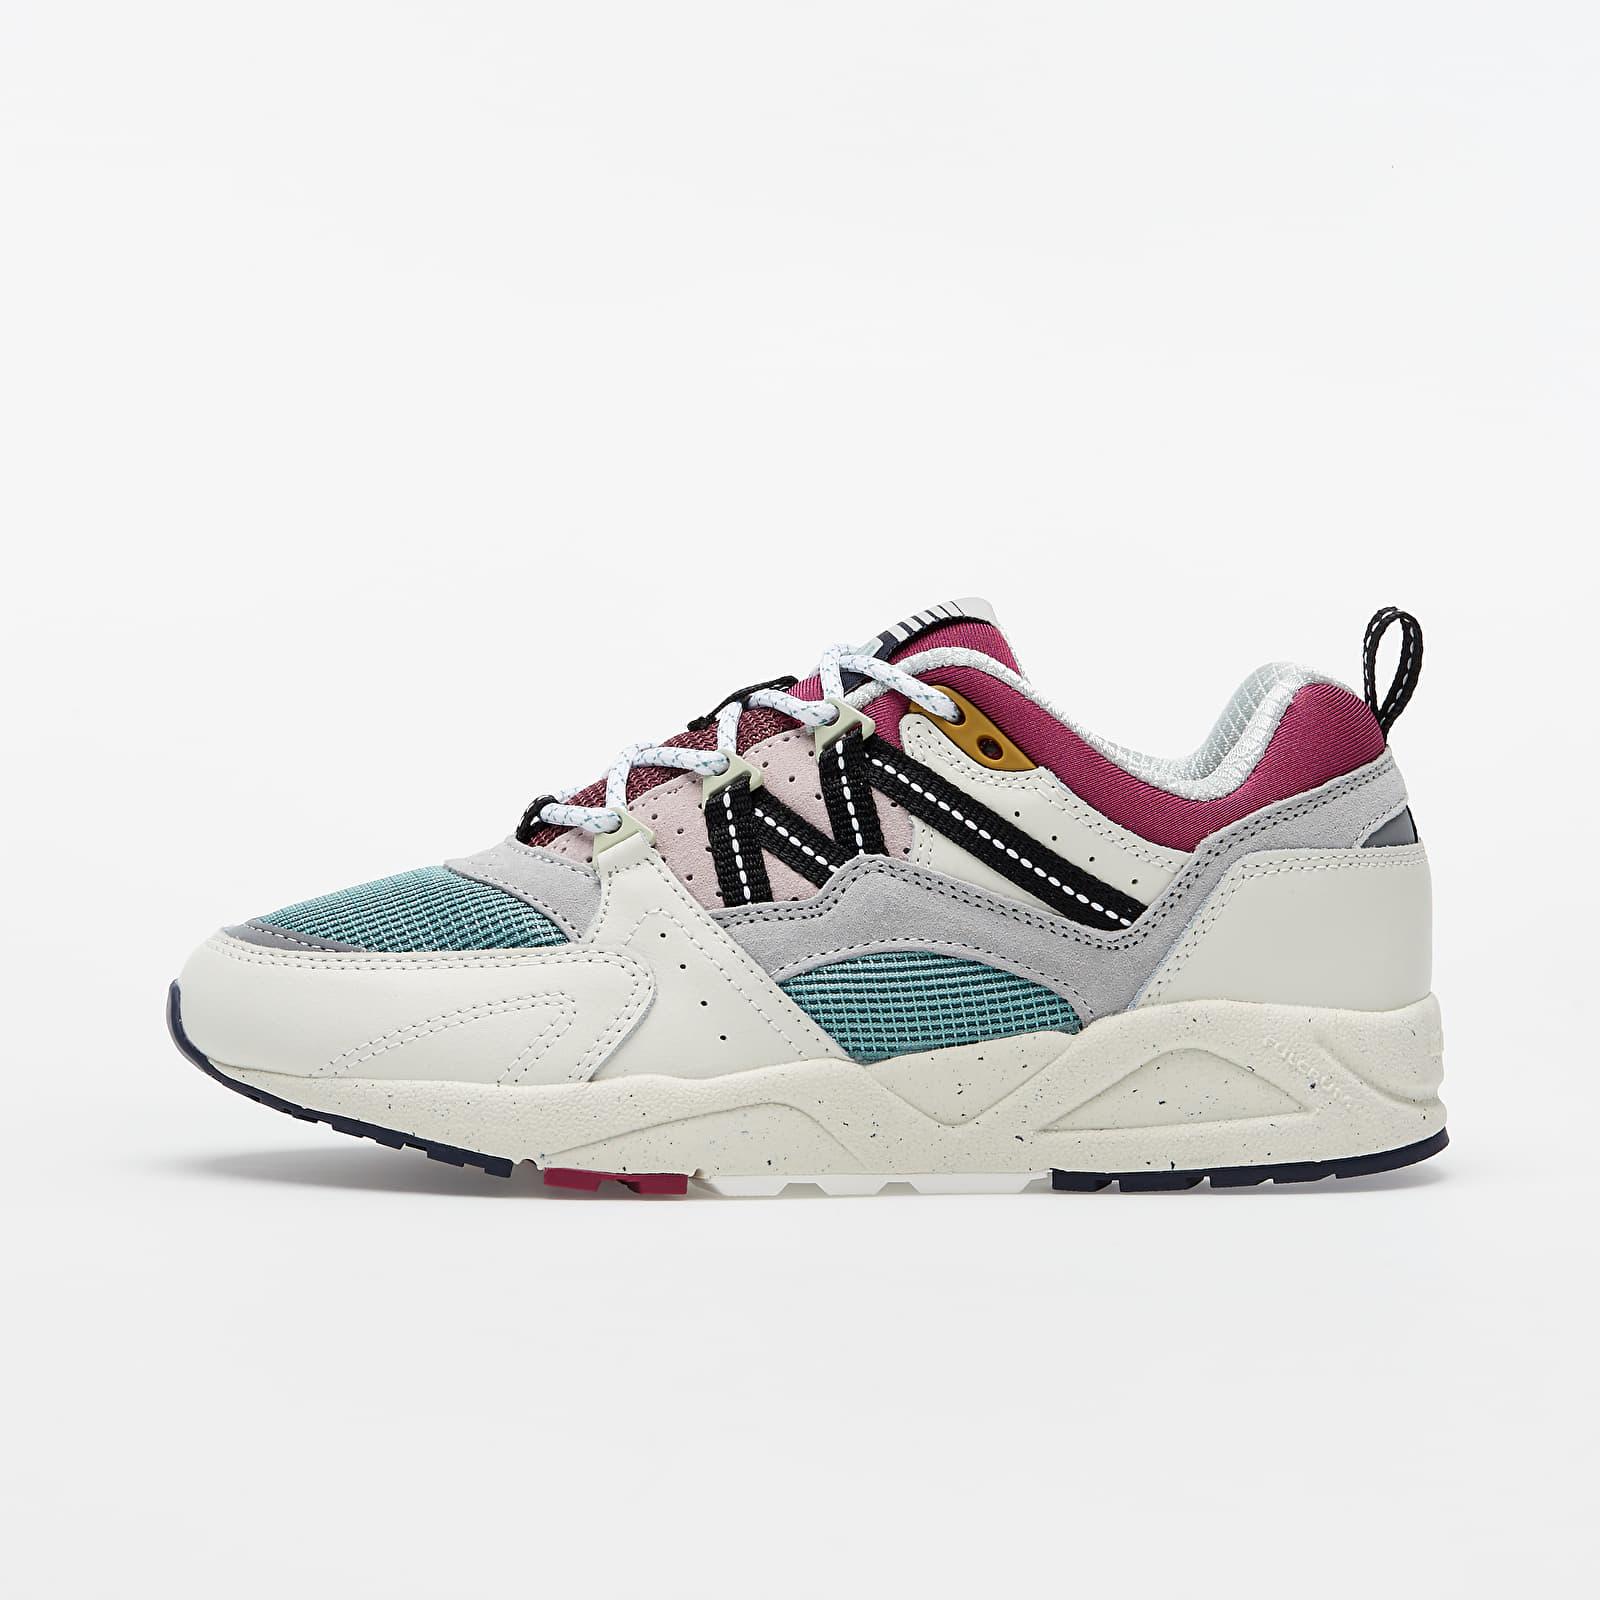 Férfi cipők Karhu Fusion 2.0 Lily Lily/ Gray Violet